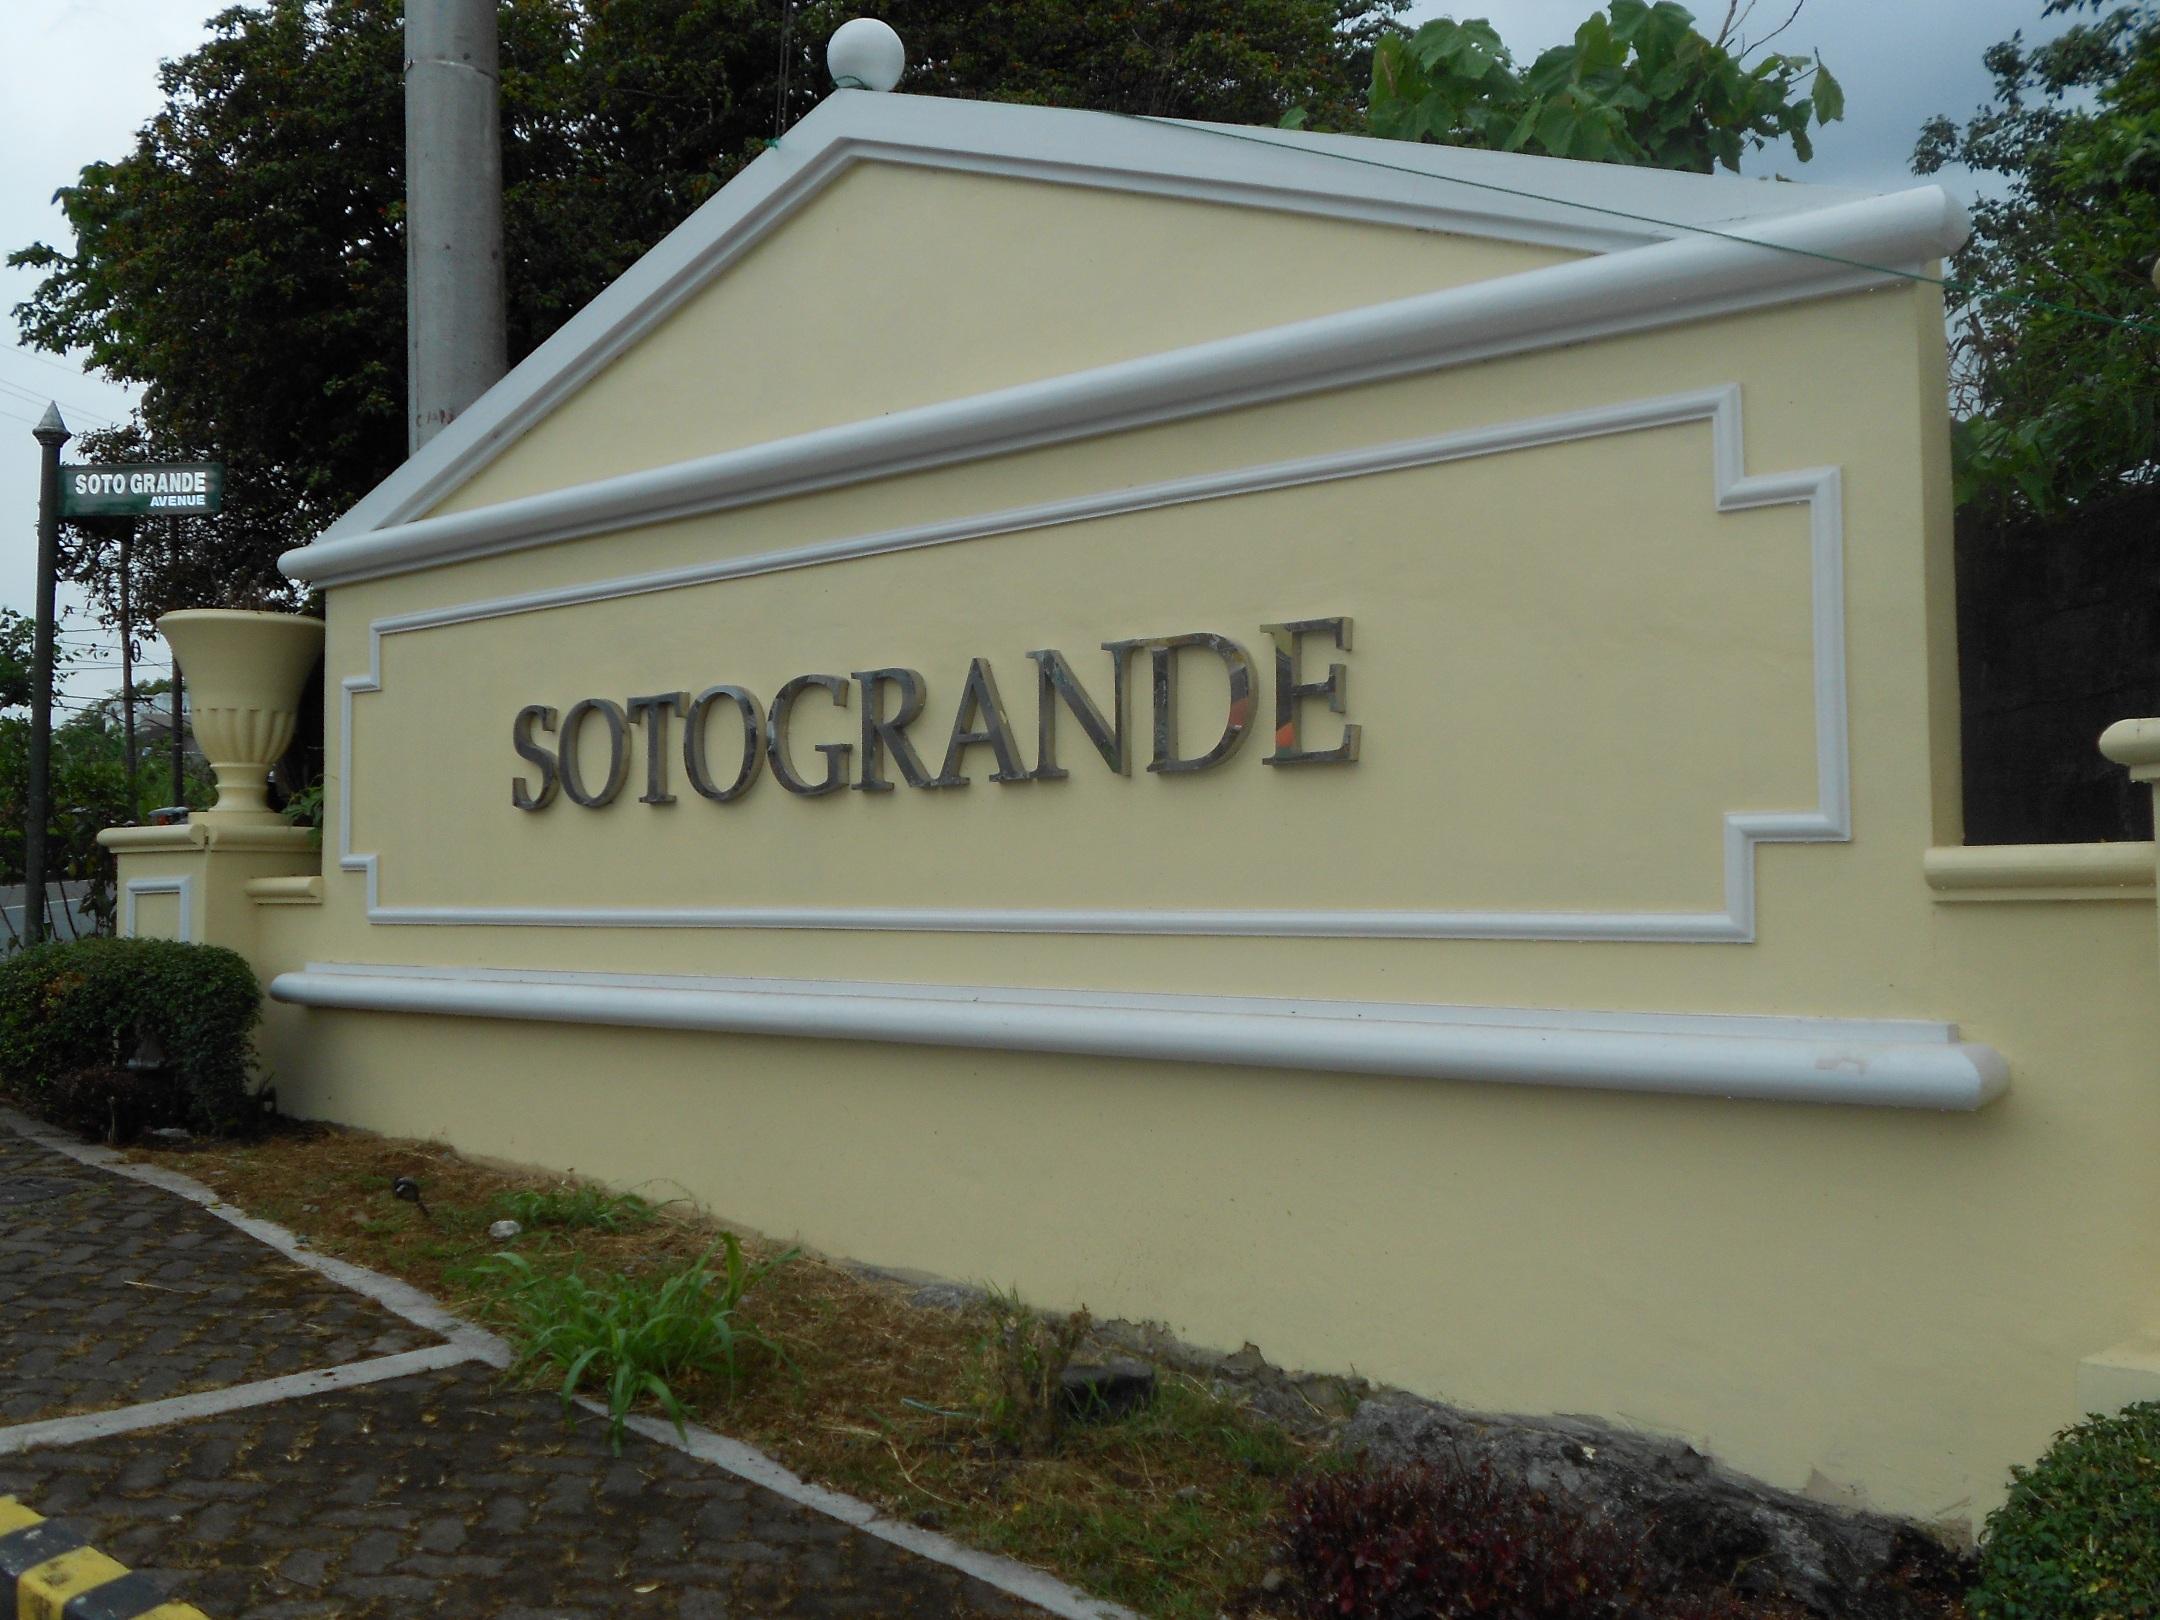 Sotogrande_Tagaytay_Residential_Lot_for_Sale_3.jpg